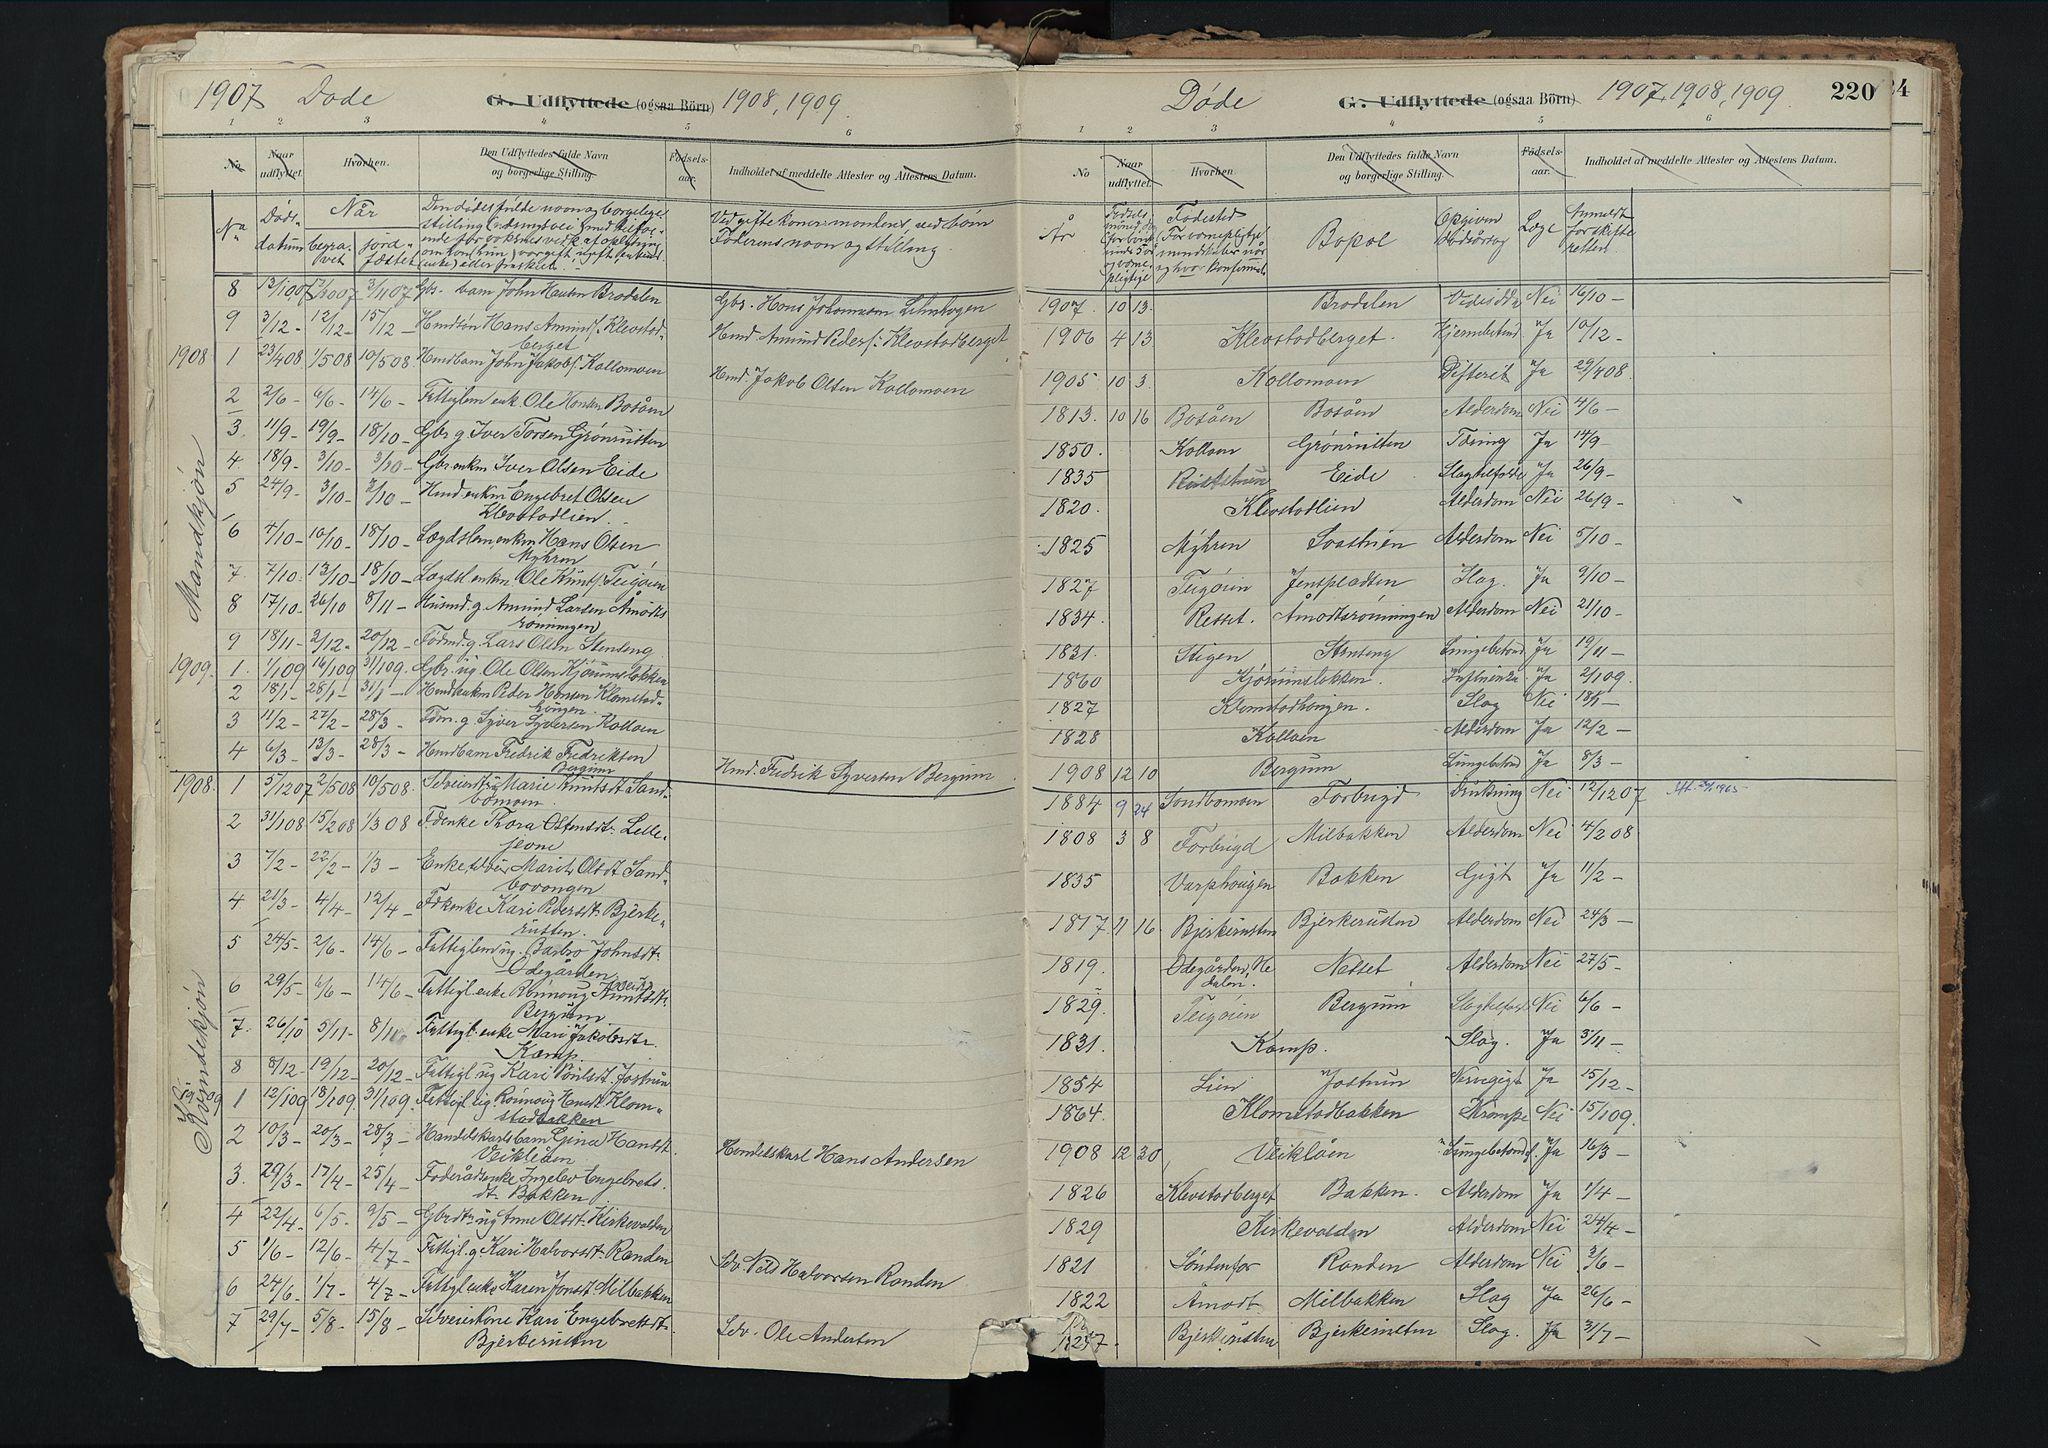 SAH, Nord-Fron prestekontor, Ministerialbok nr. 3, 1884-1914, s. 220